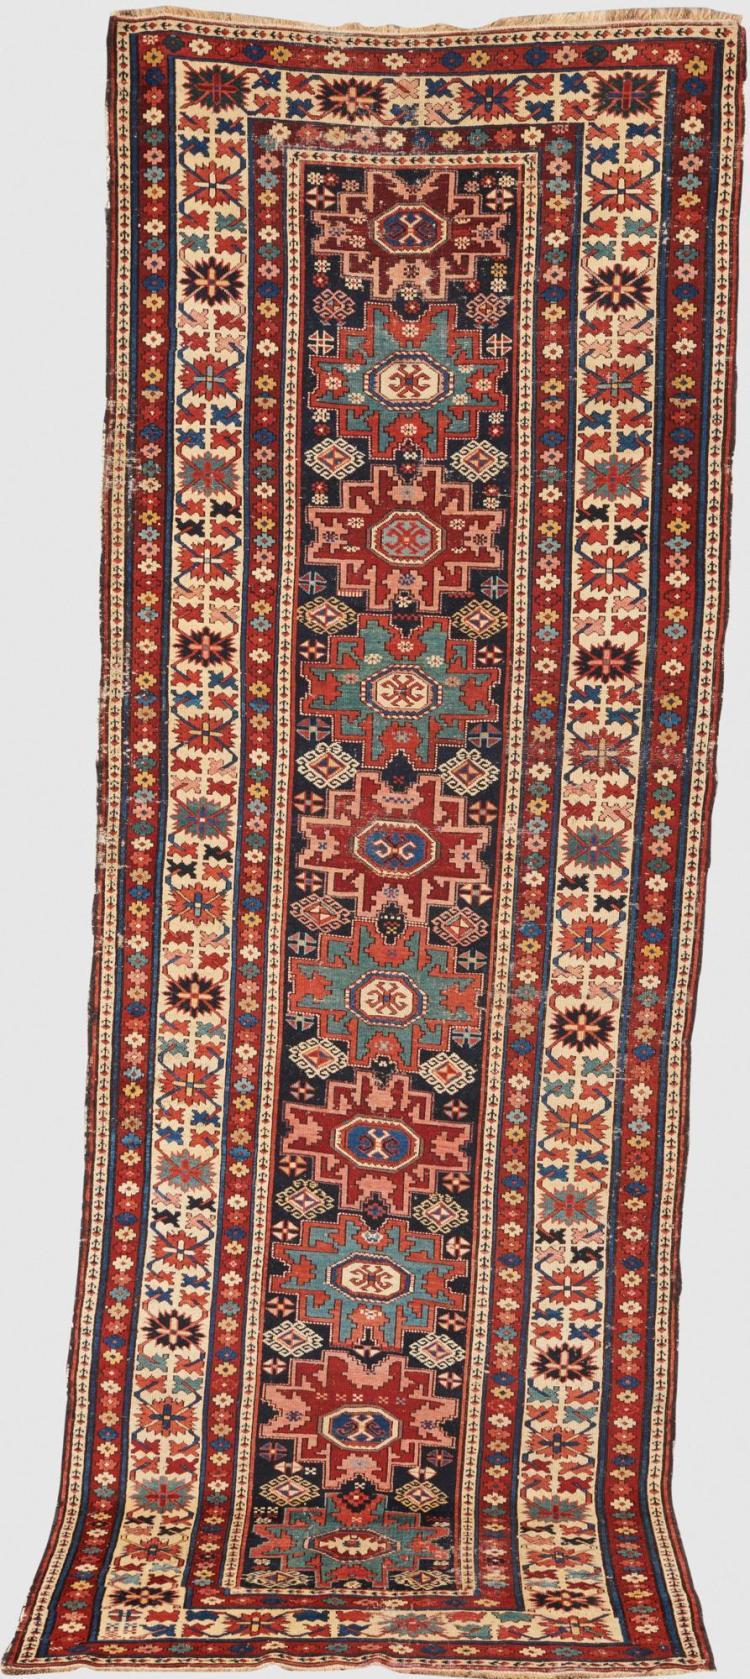 Lesghi Runner, Caucasus, ca. 1880; 9 ft. 11 in. x 3 ft. 5 1/2 in.